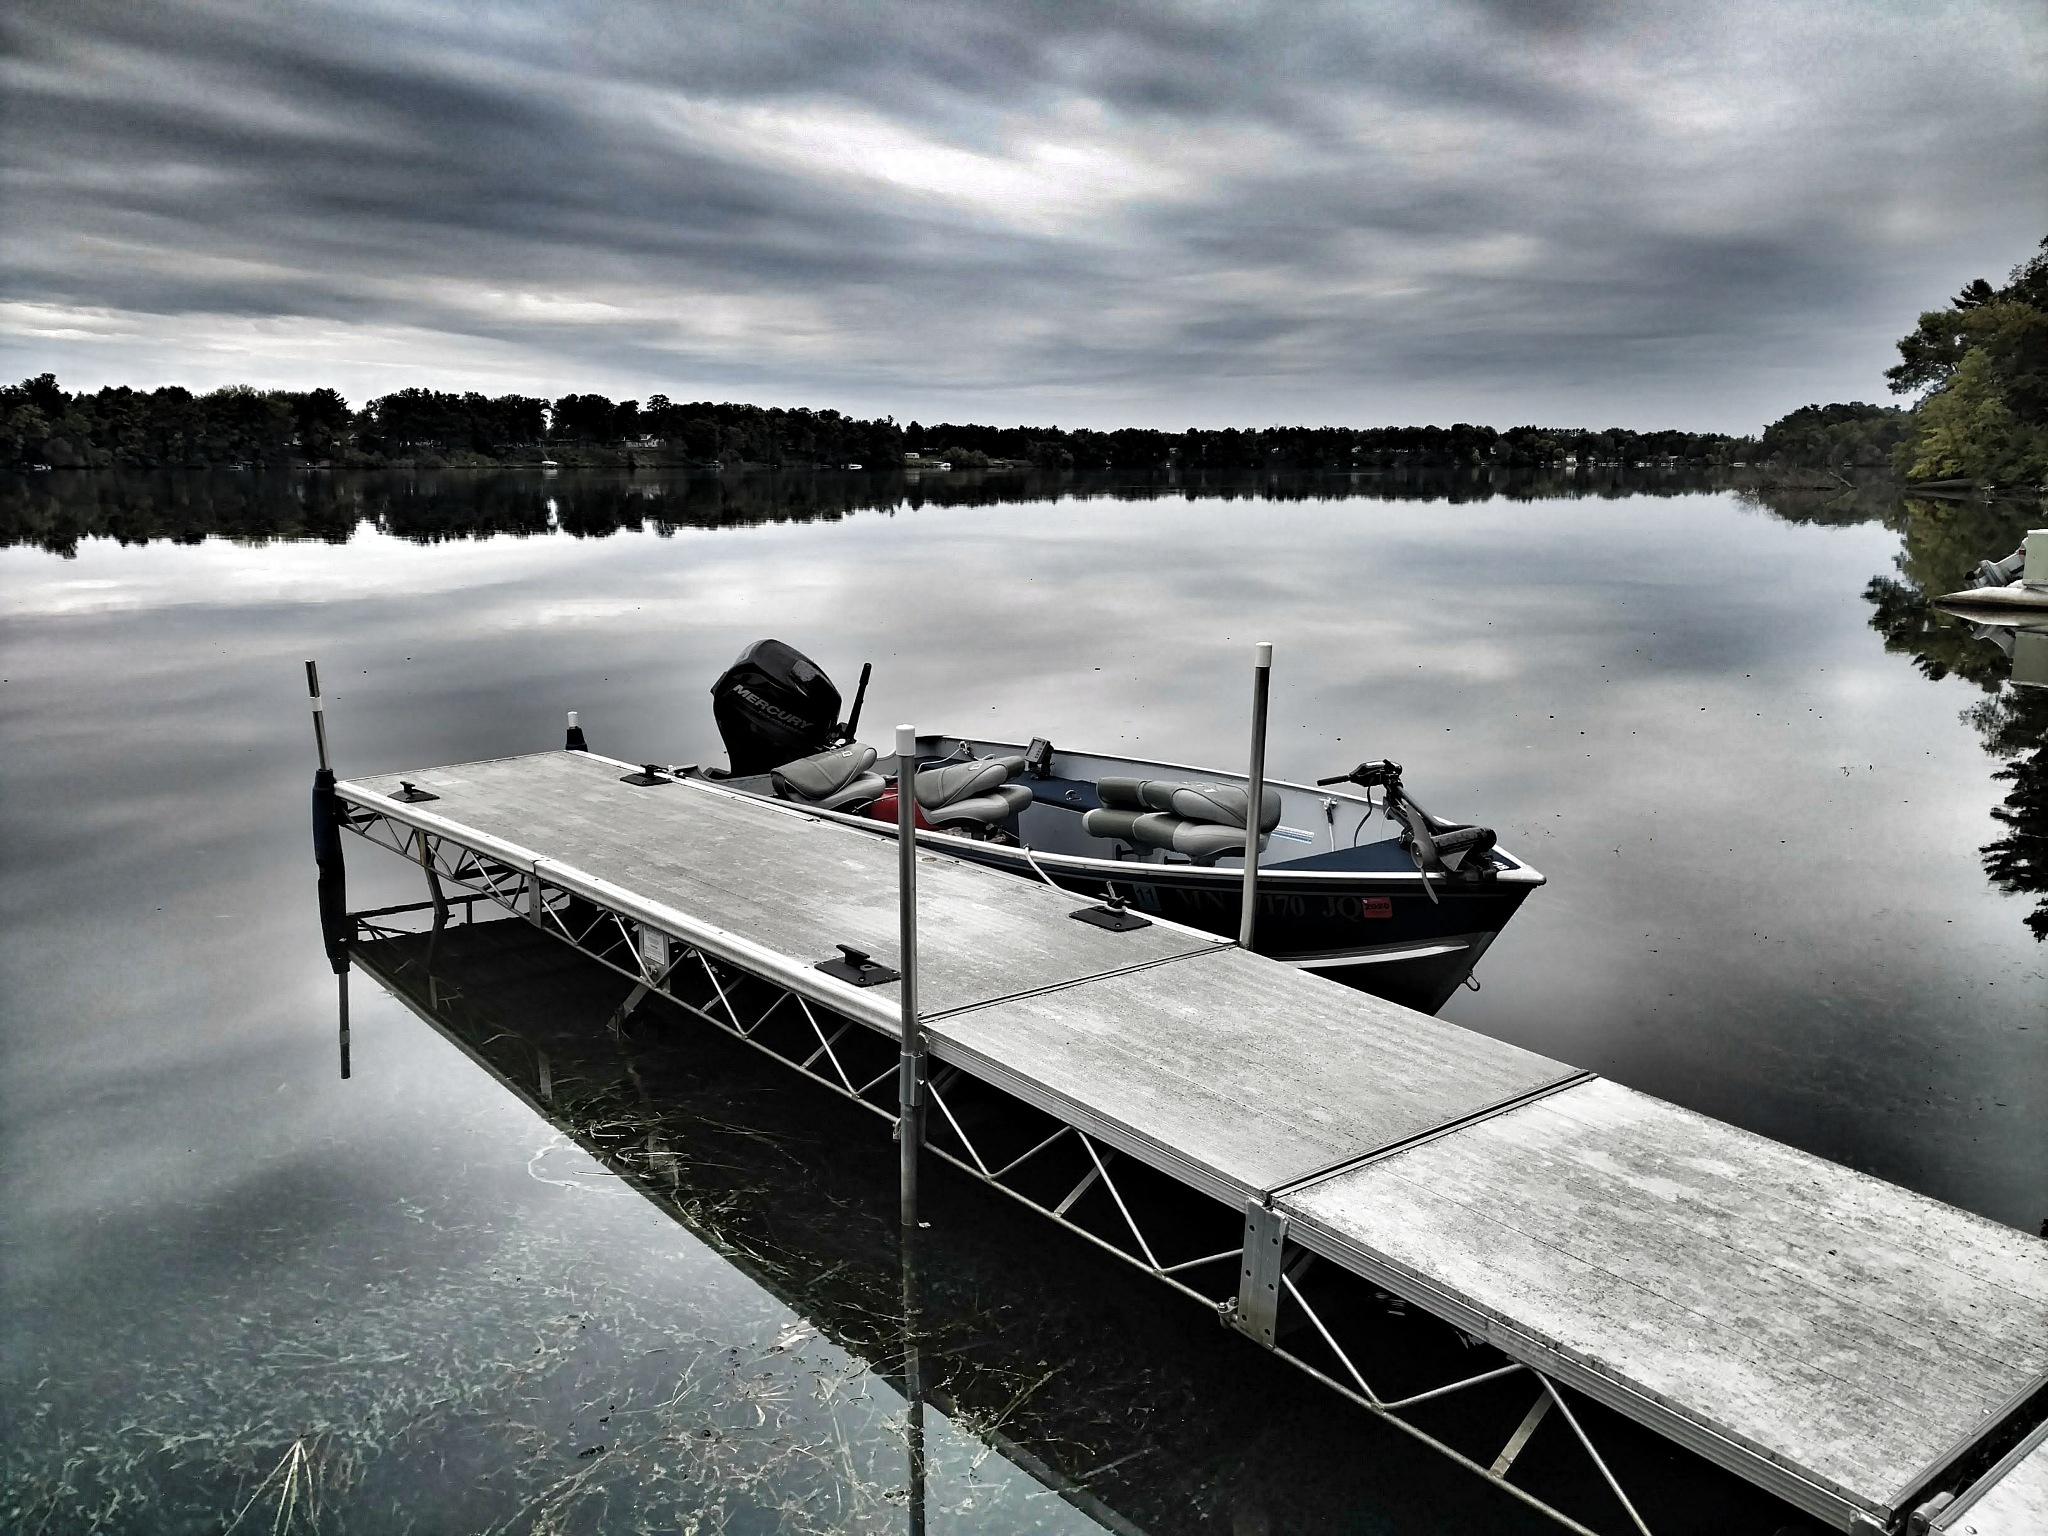 On Rice Lake by Randy C. Nichols photography